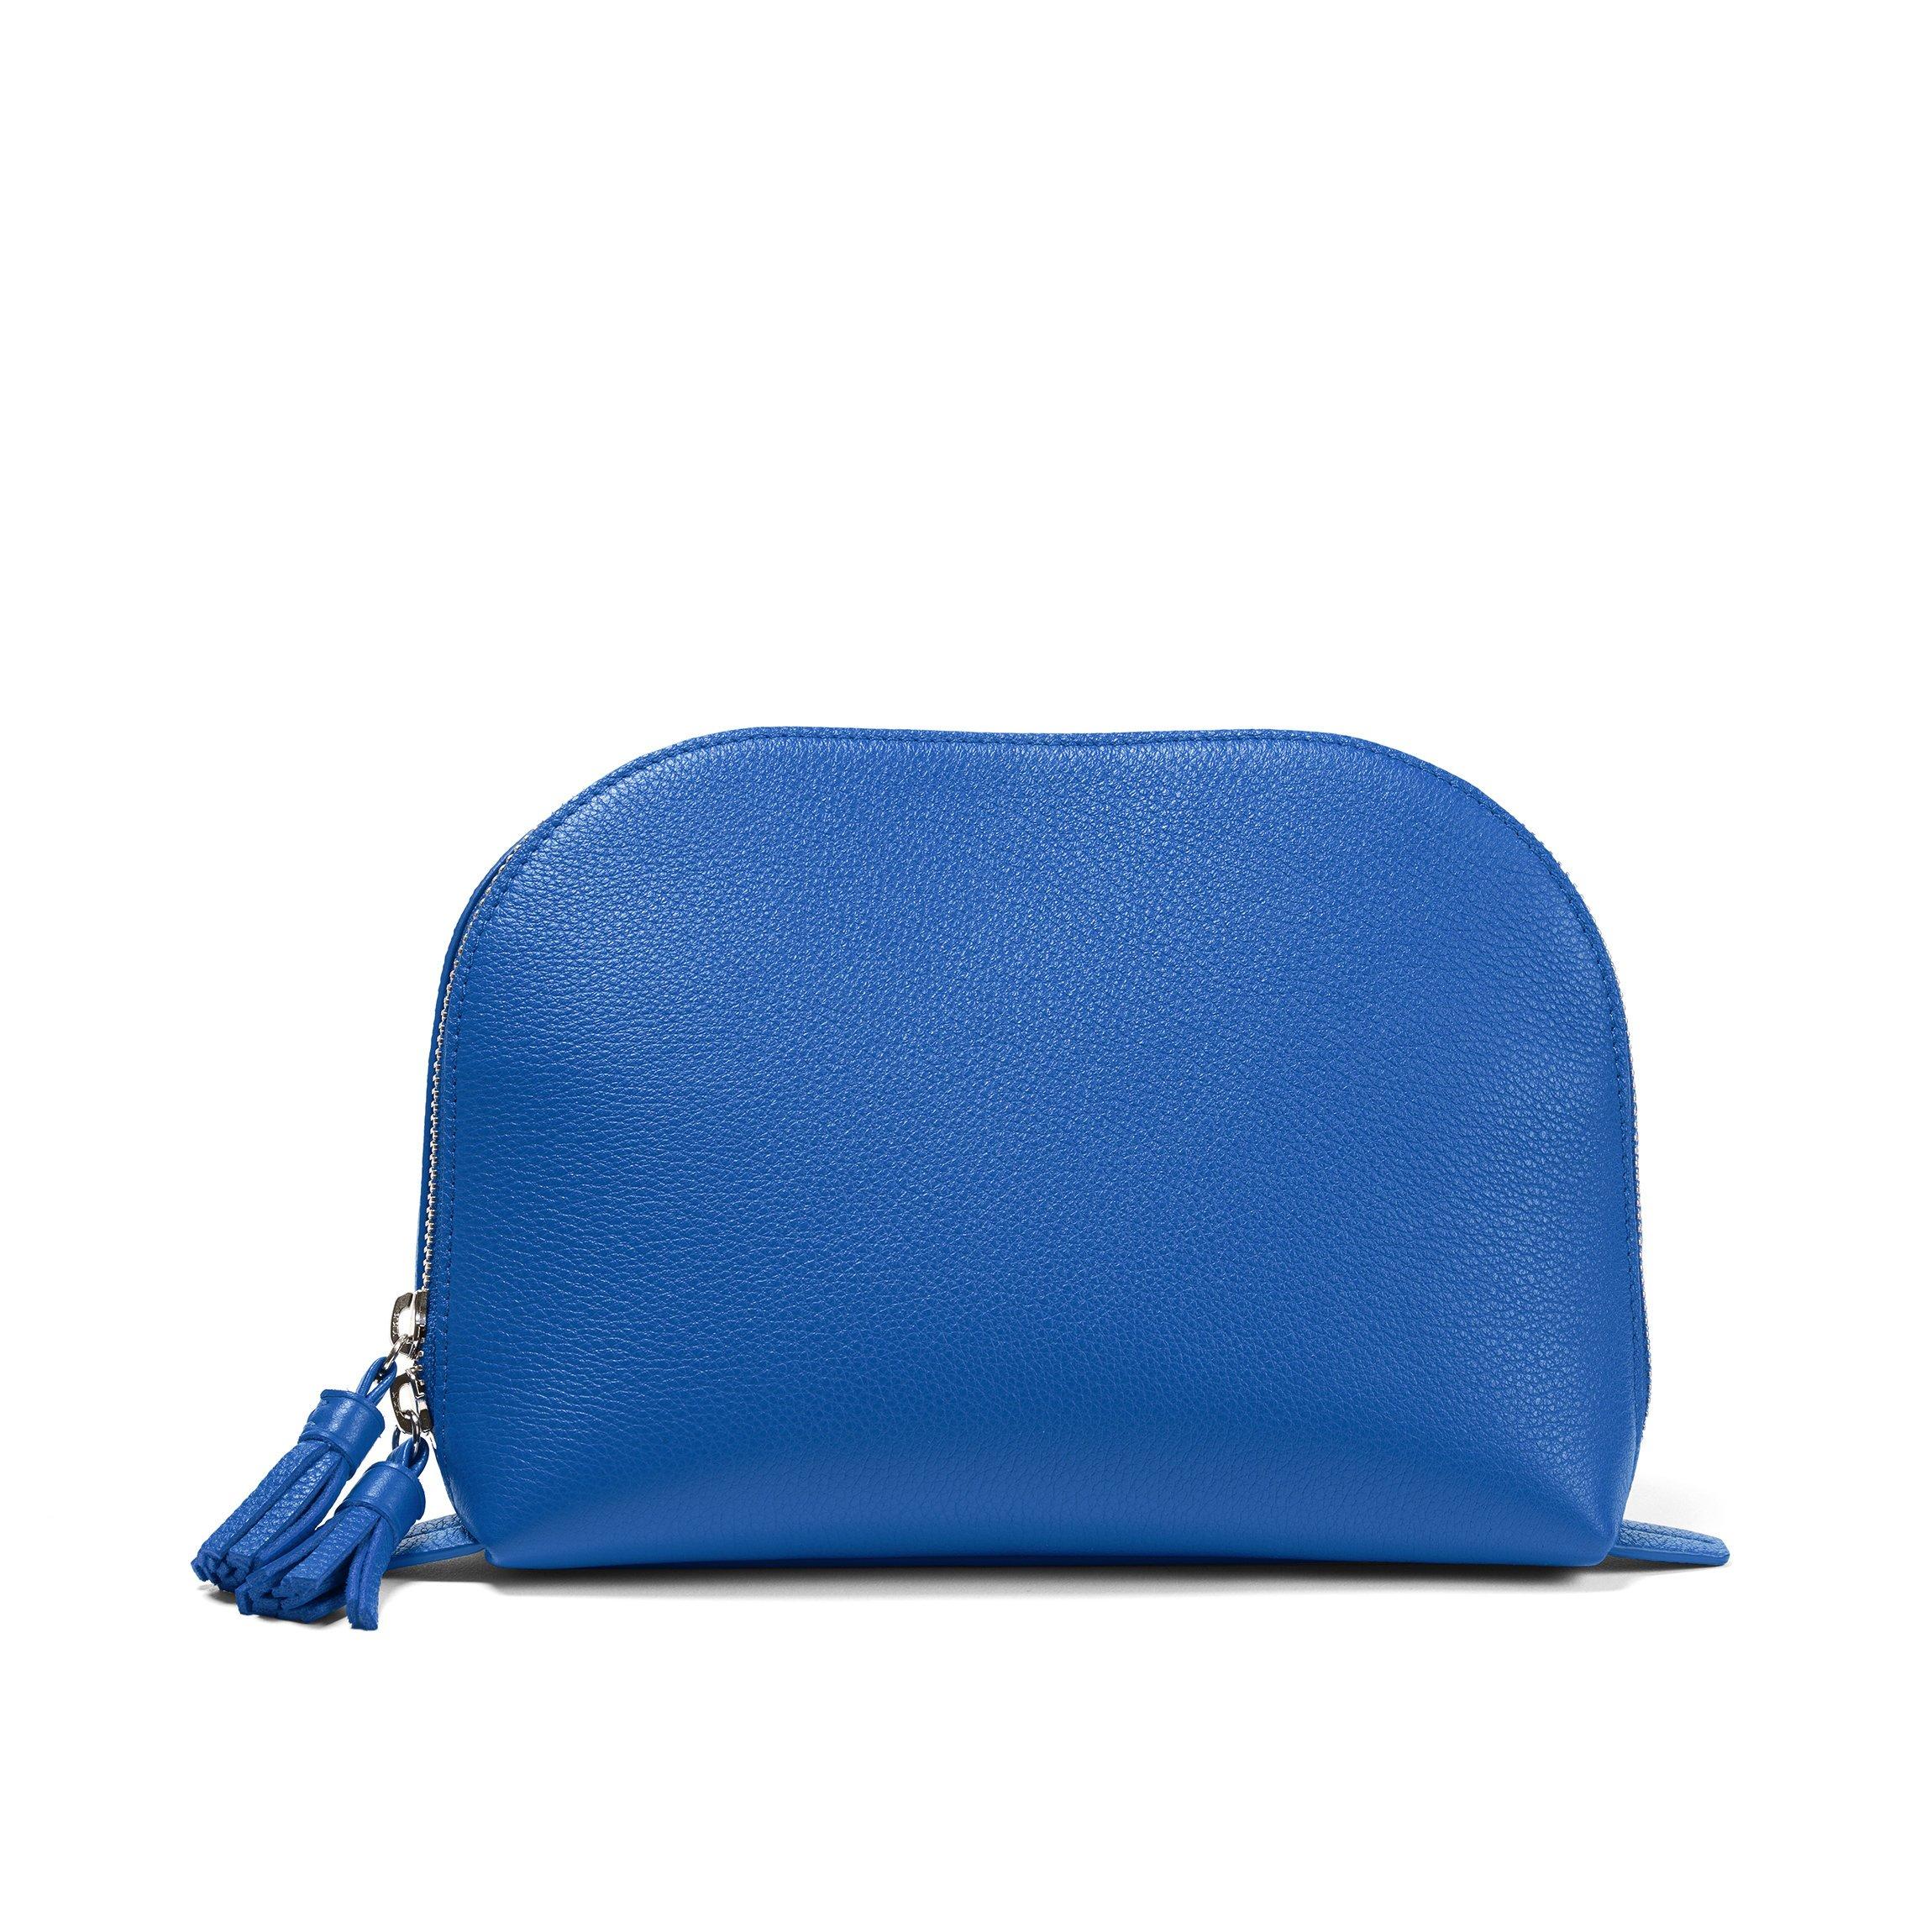 Large Clamshell Makeup Bag - Full Grain Leather Leather - Cobalt (blue)